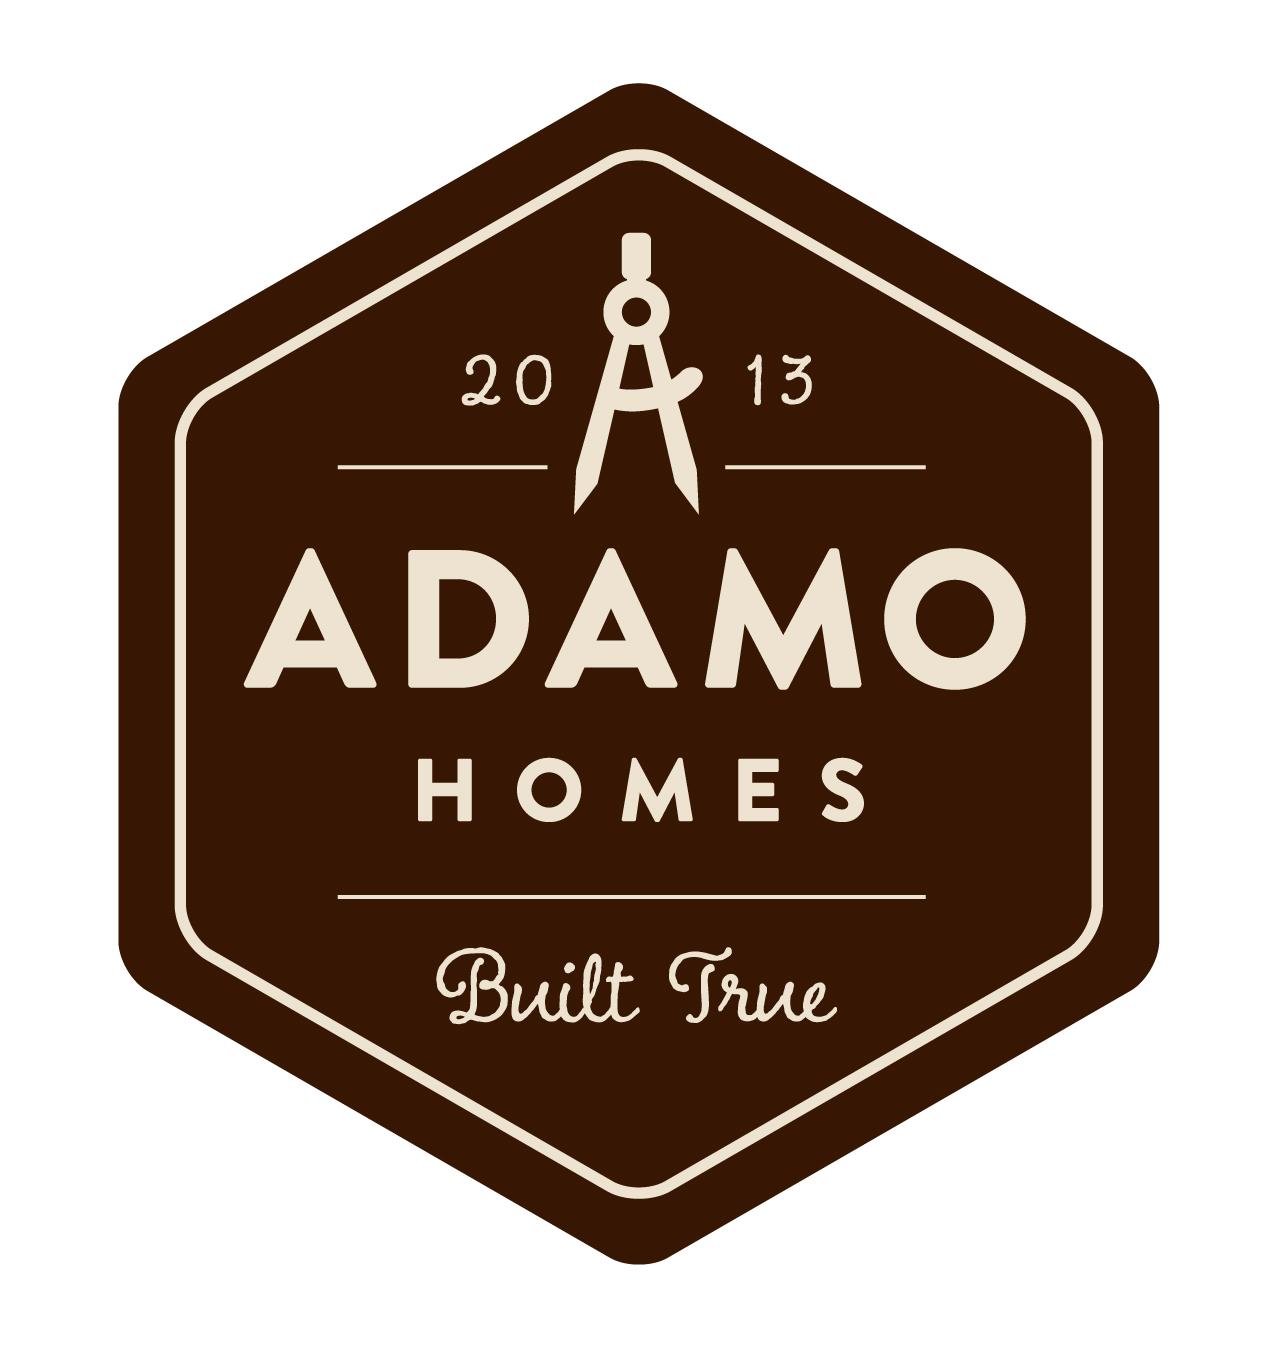 Adamo Homes